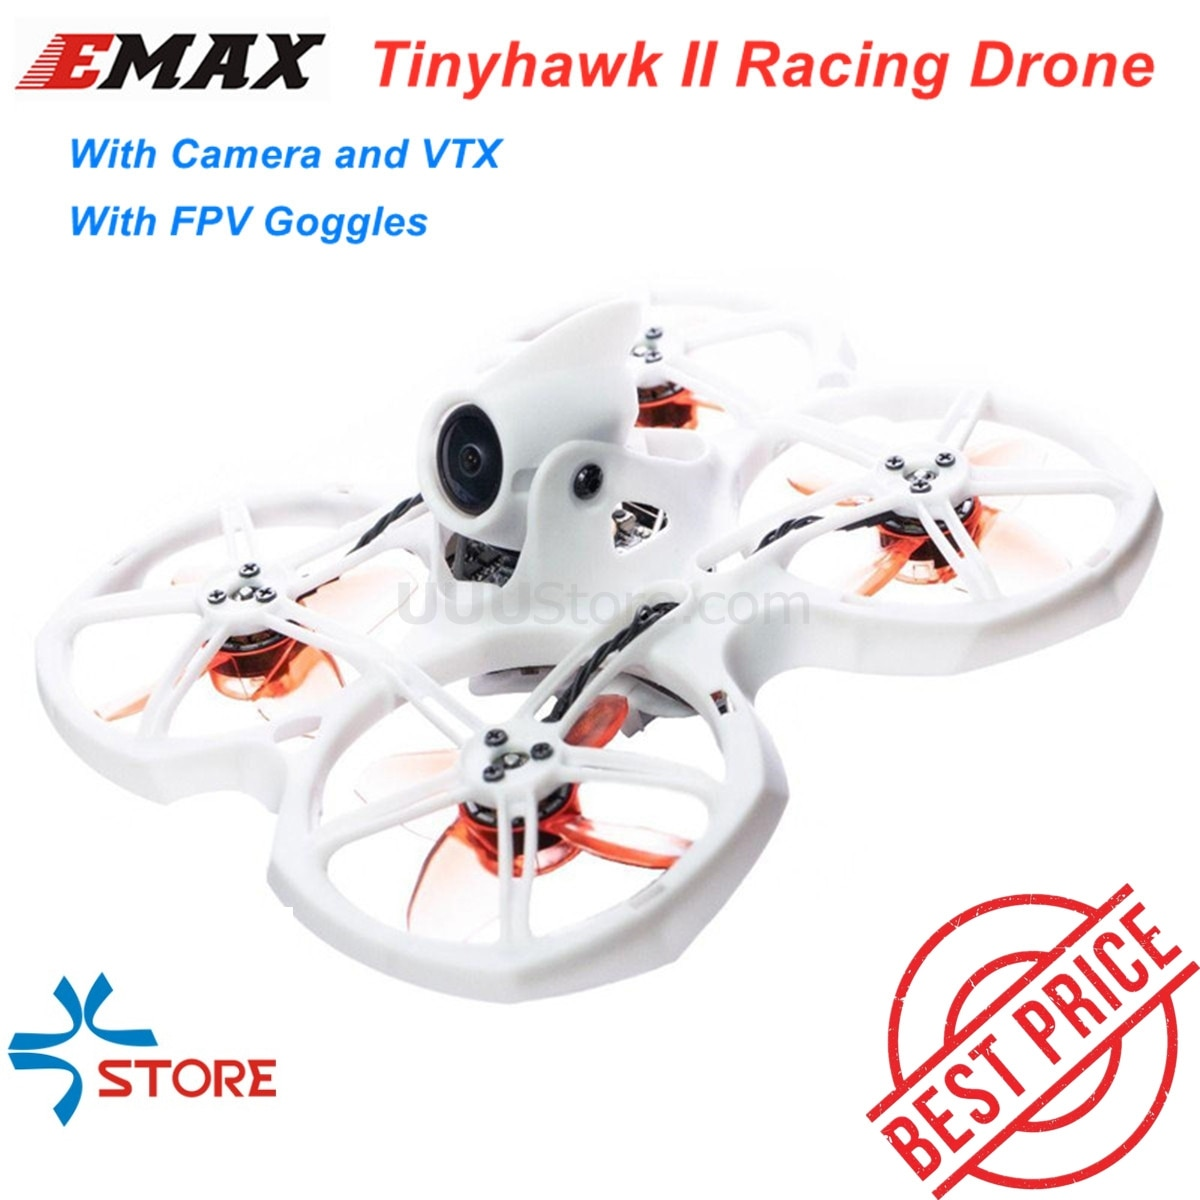 EMAX Tinyhawk II 75mm 1-2S Whoop FPV Racing Drone RC Quadcopter BNF RTF w/ FrSky D8 Runcam 2 Cam Camera 25/100/200mw VTX ESC